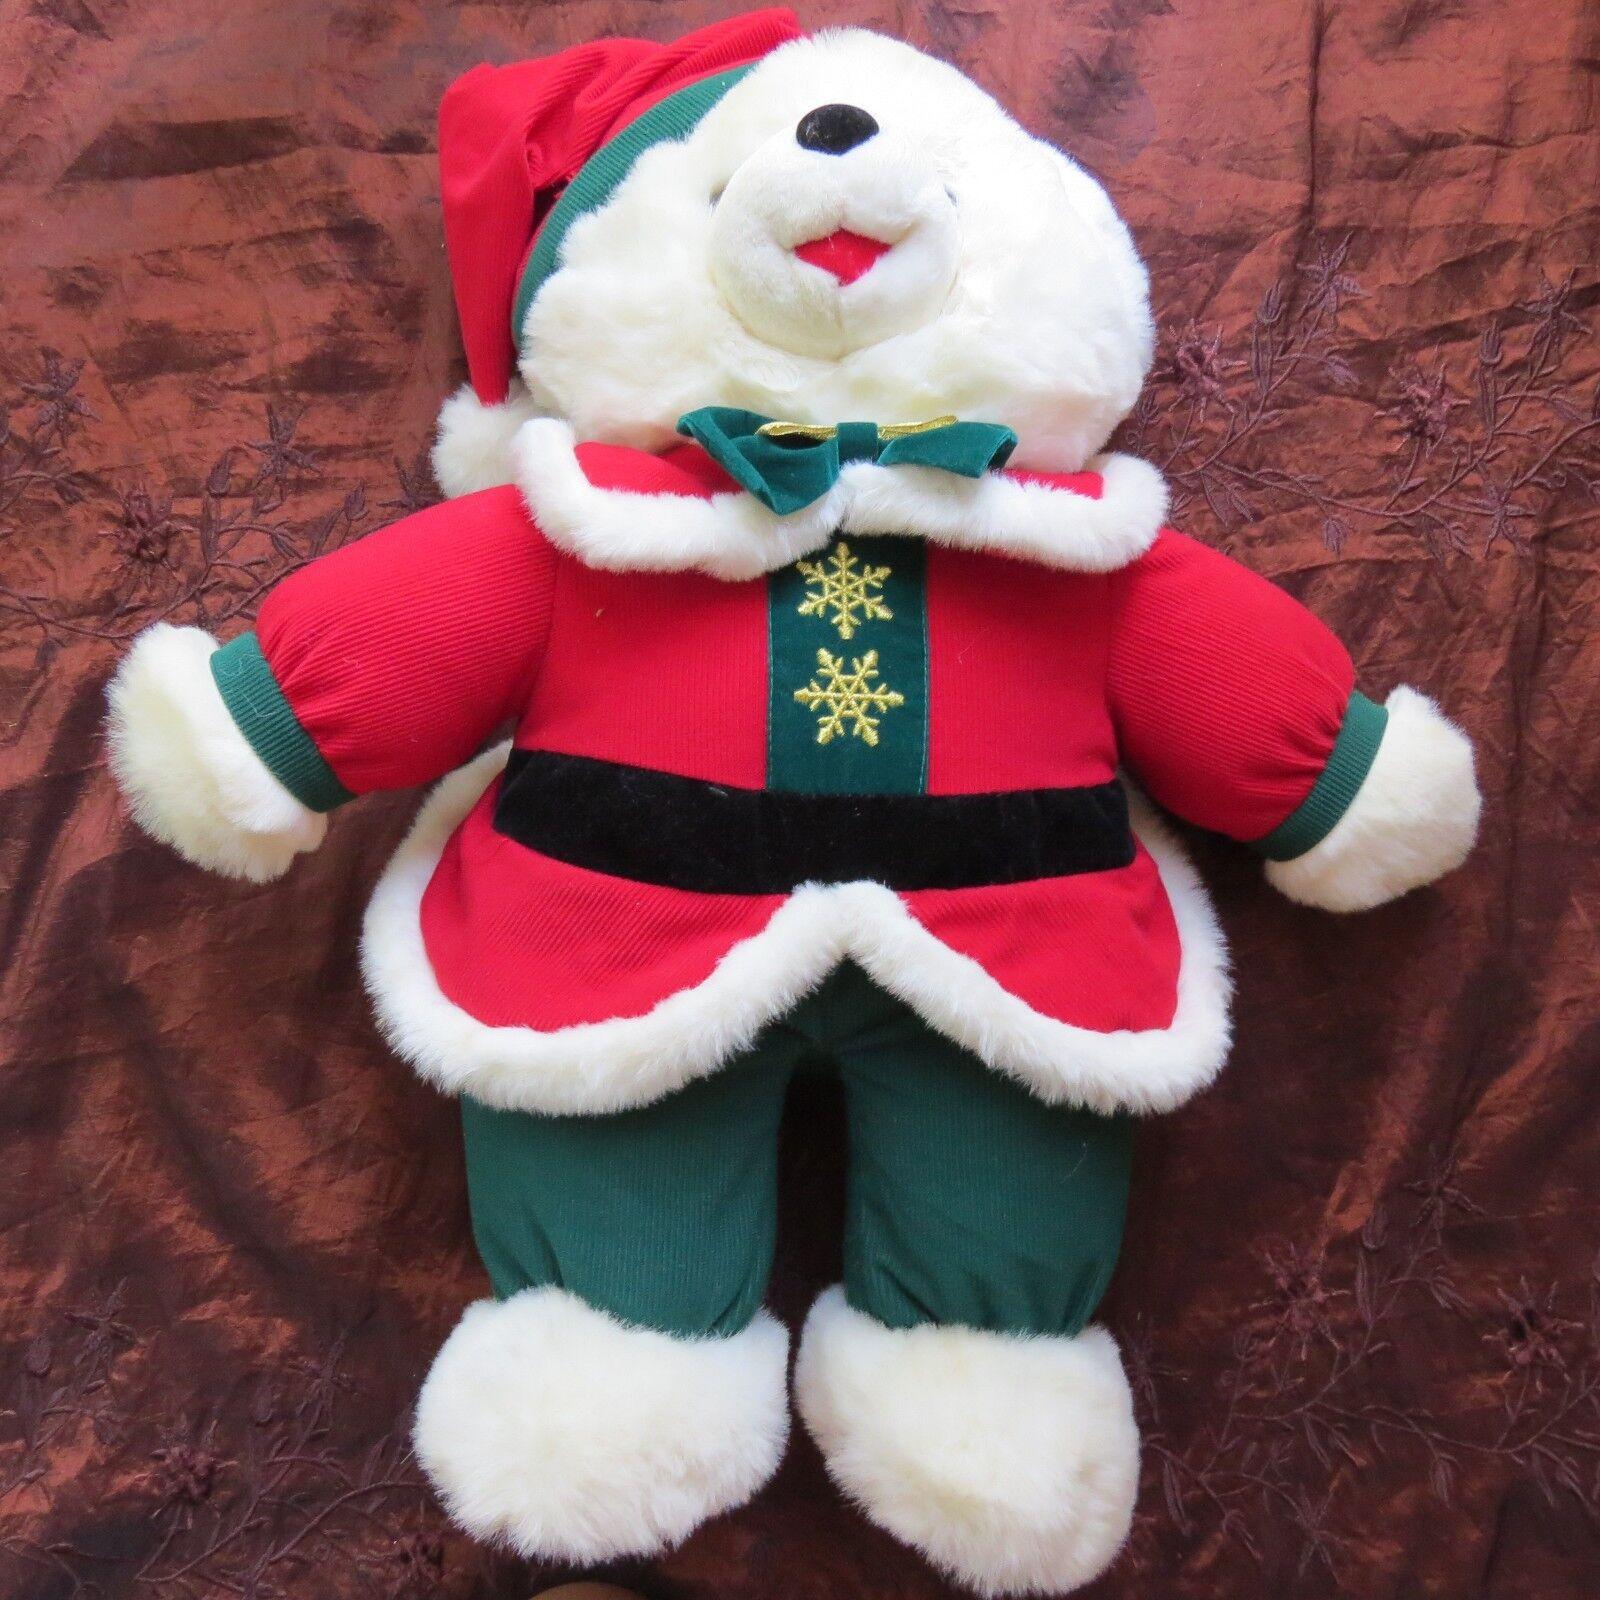 ADORABLE      1995 Snowflake Teddy Bears rot cape & hat (   4) 9e1ab6